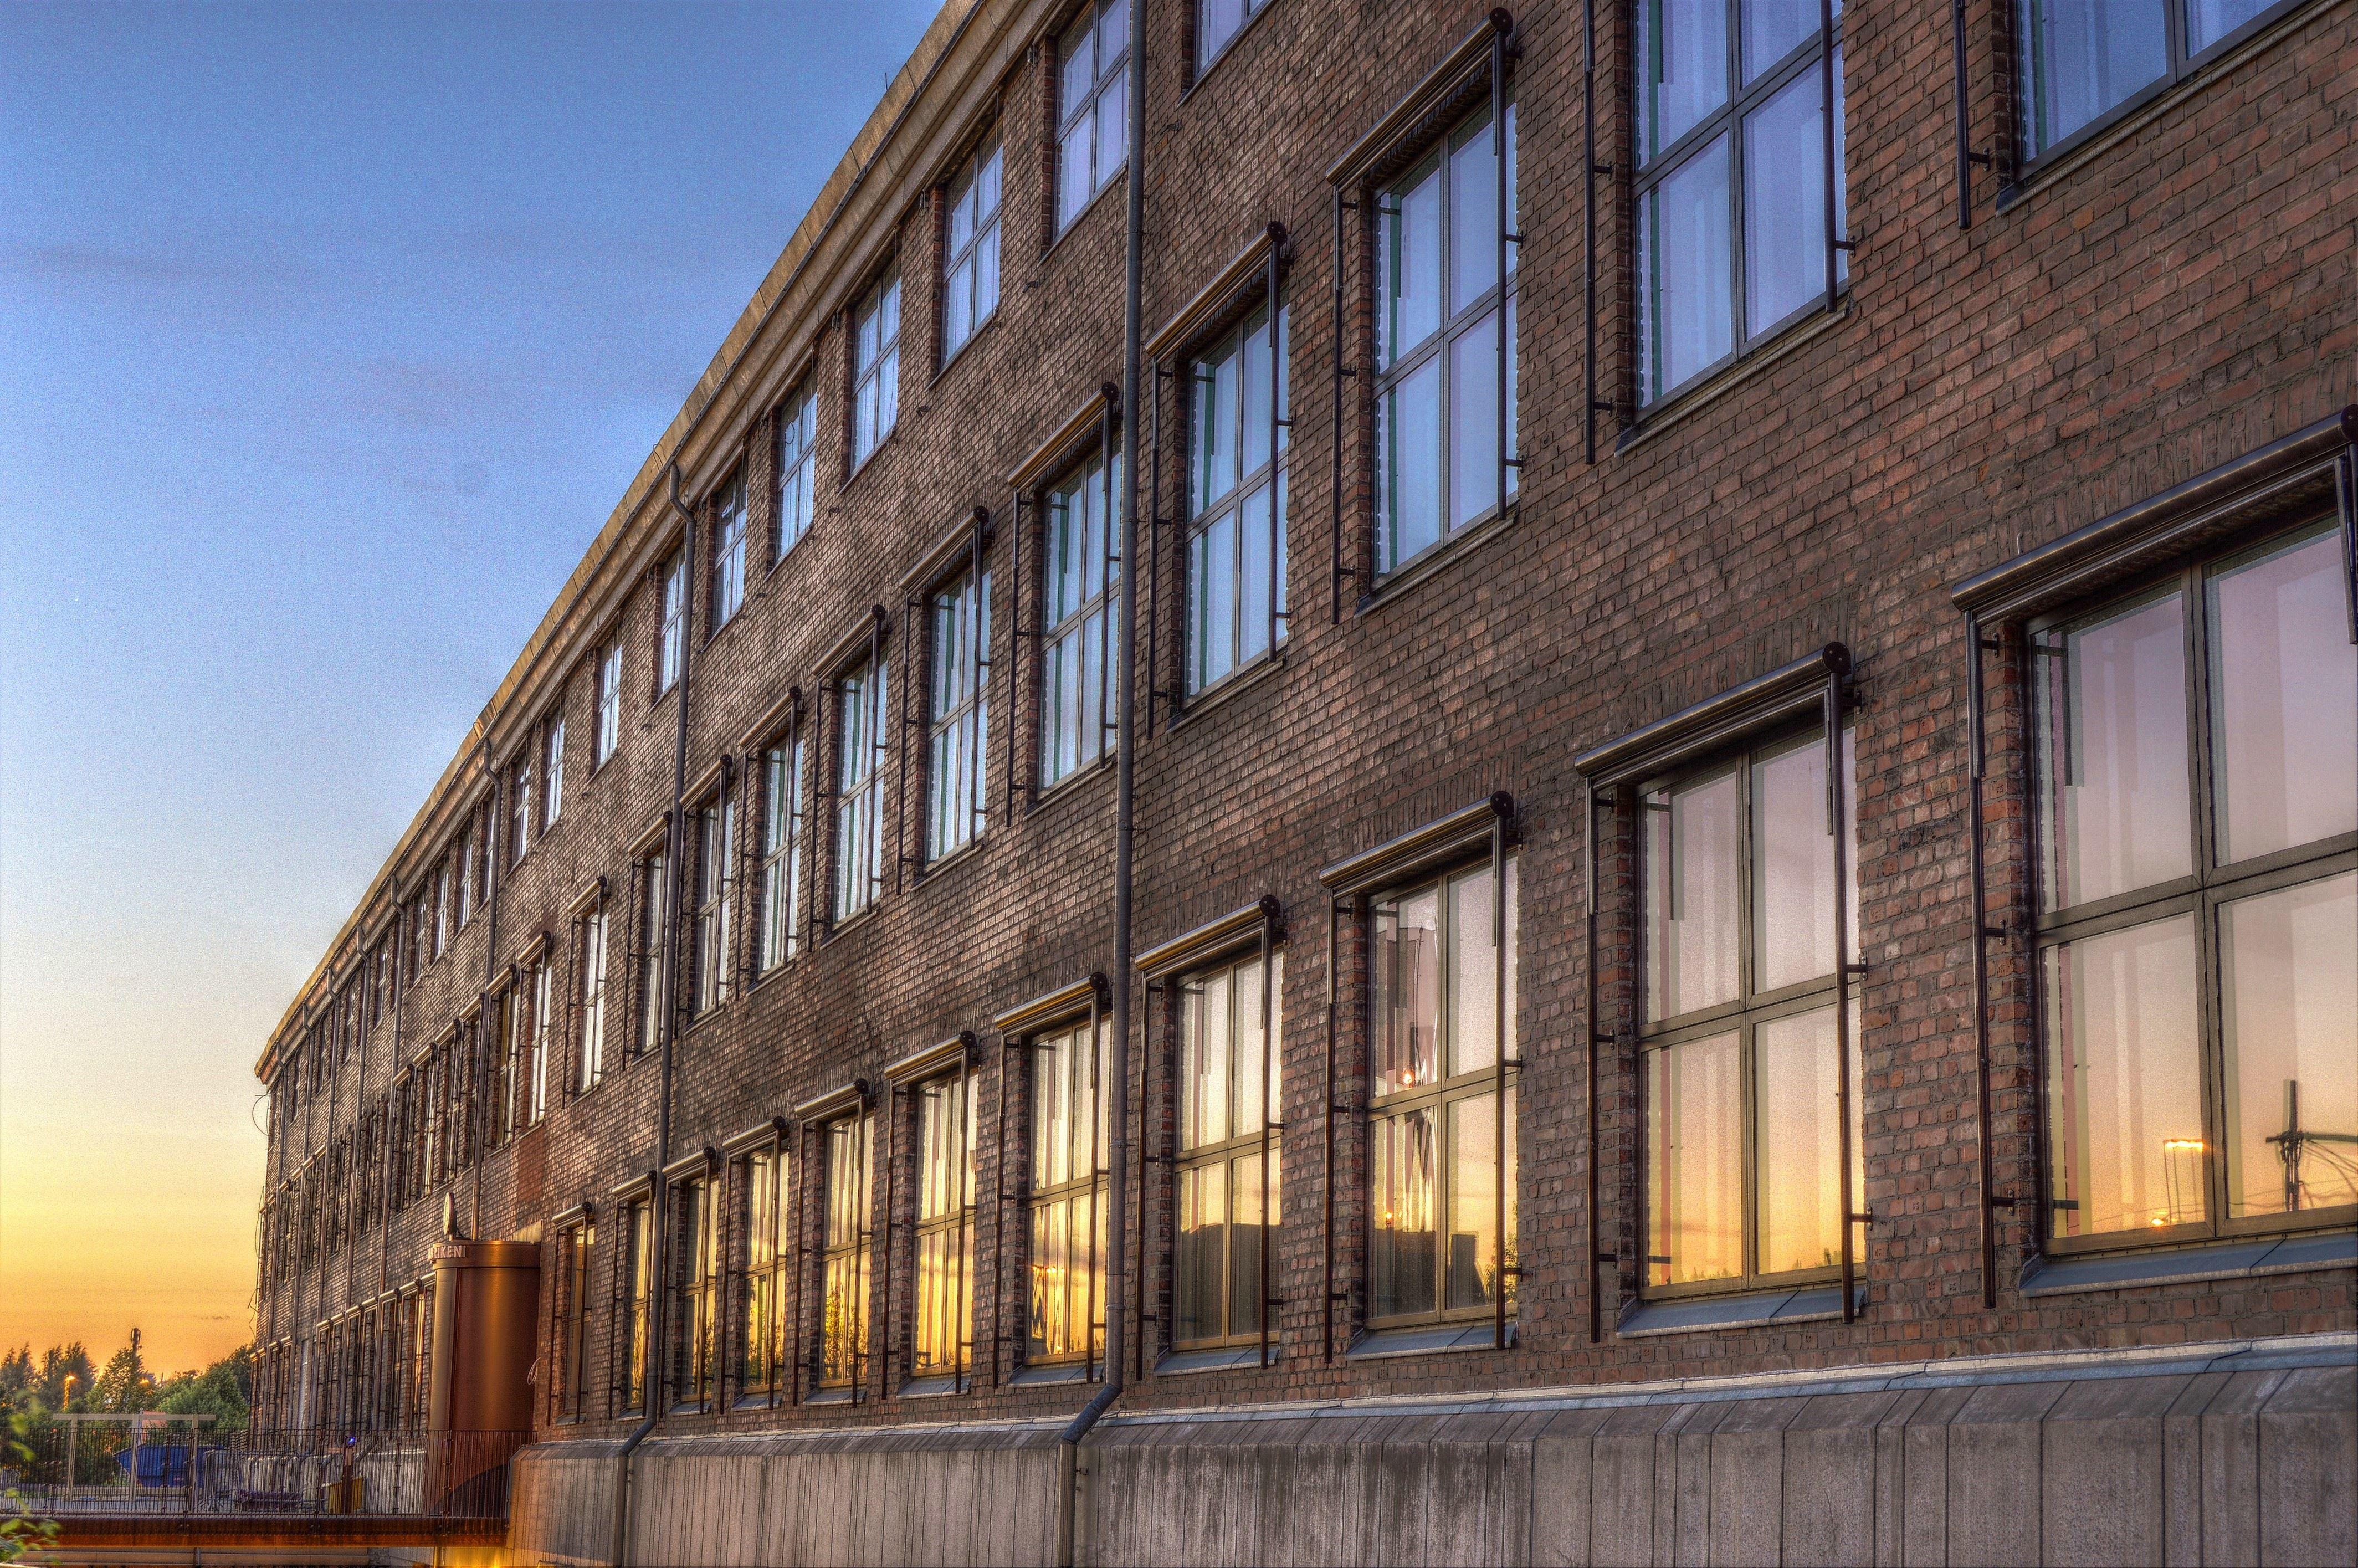 Foto: Jonathan Petersson, Invigning av Gummifabriken